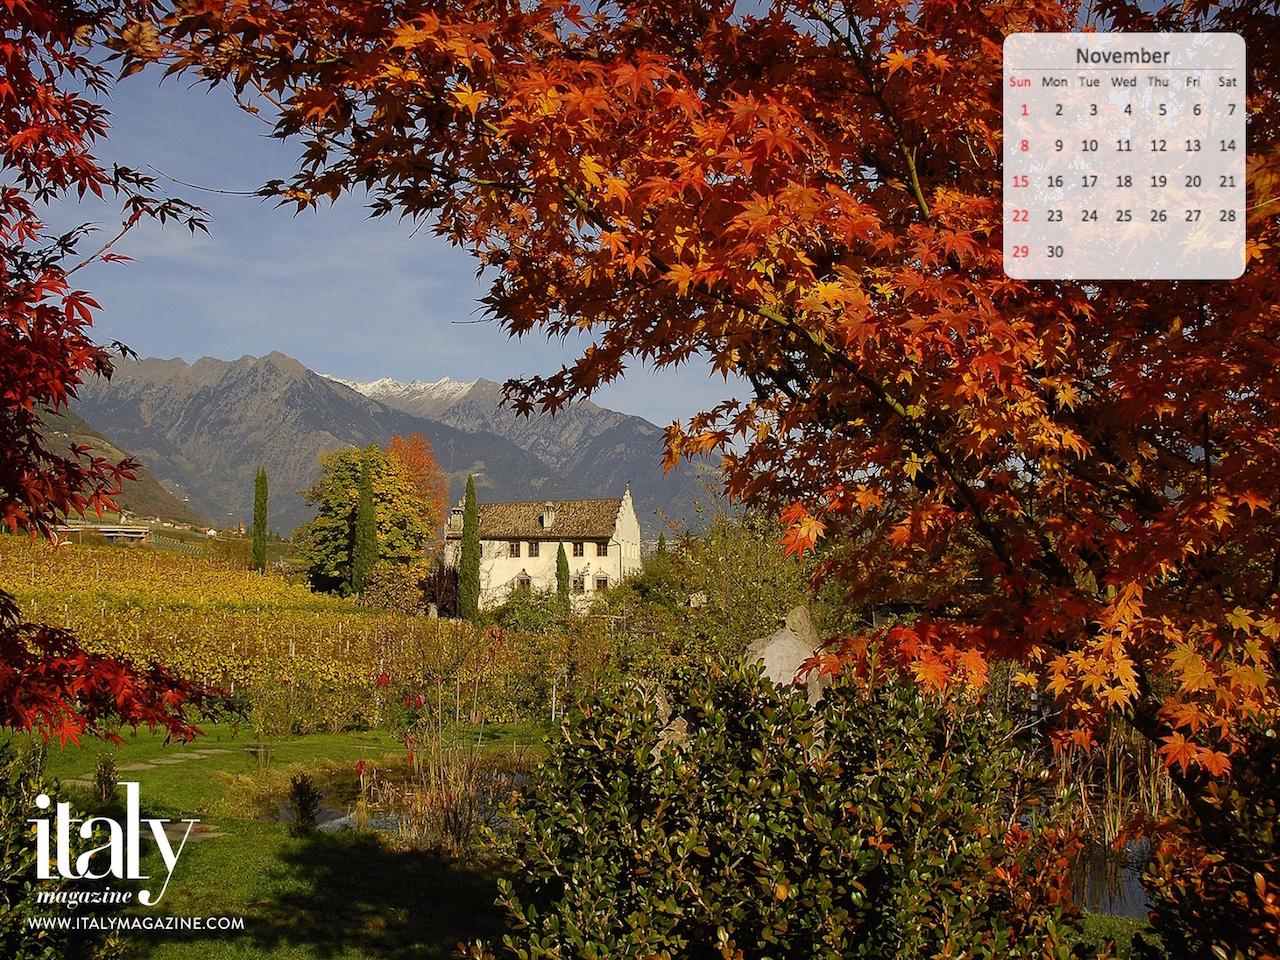 Wallpaper Calendar - November 2015 | ITALY Magazine